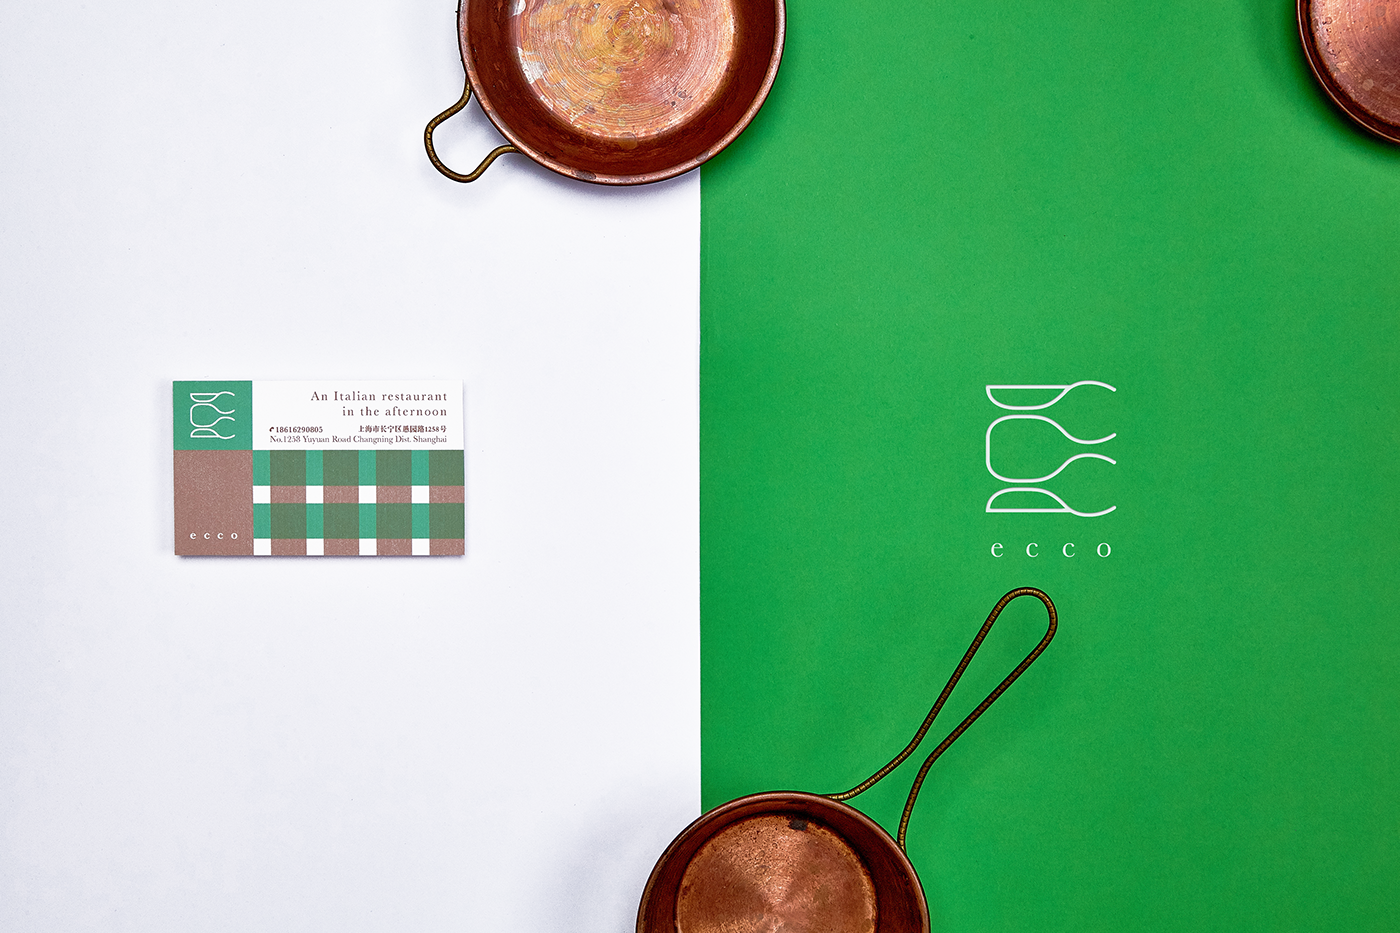 ecco restaurant & bar VI design on Behance